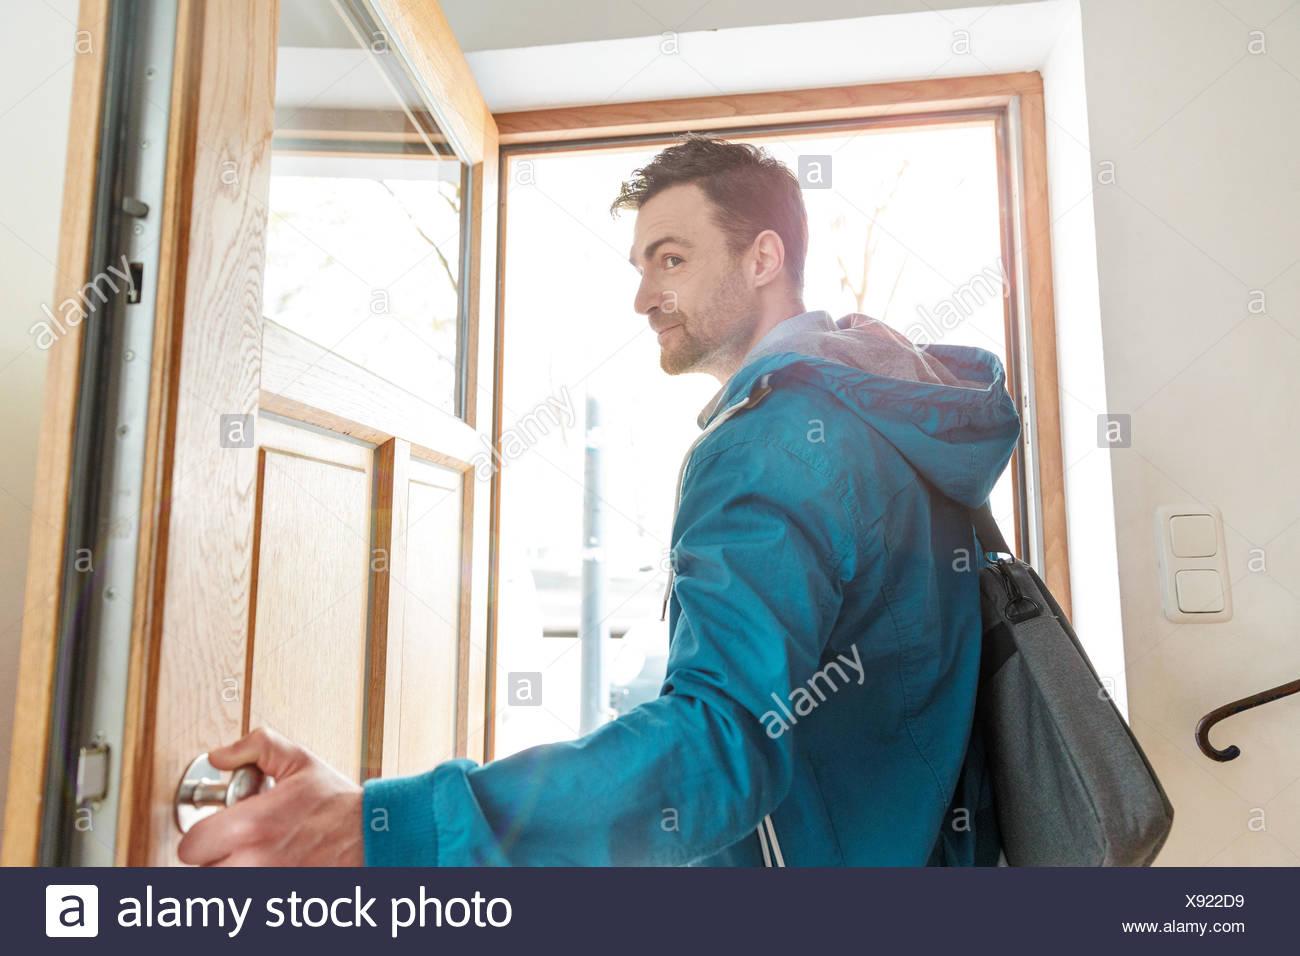 Man leaving front door of house - Stock Image